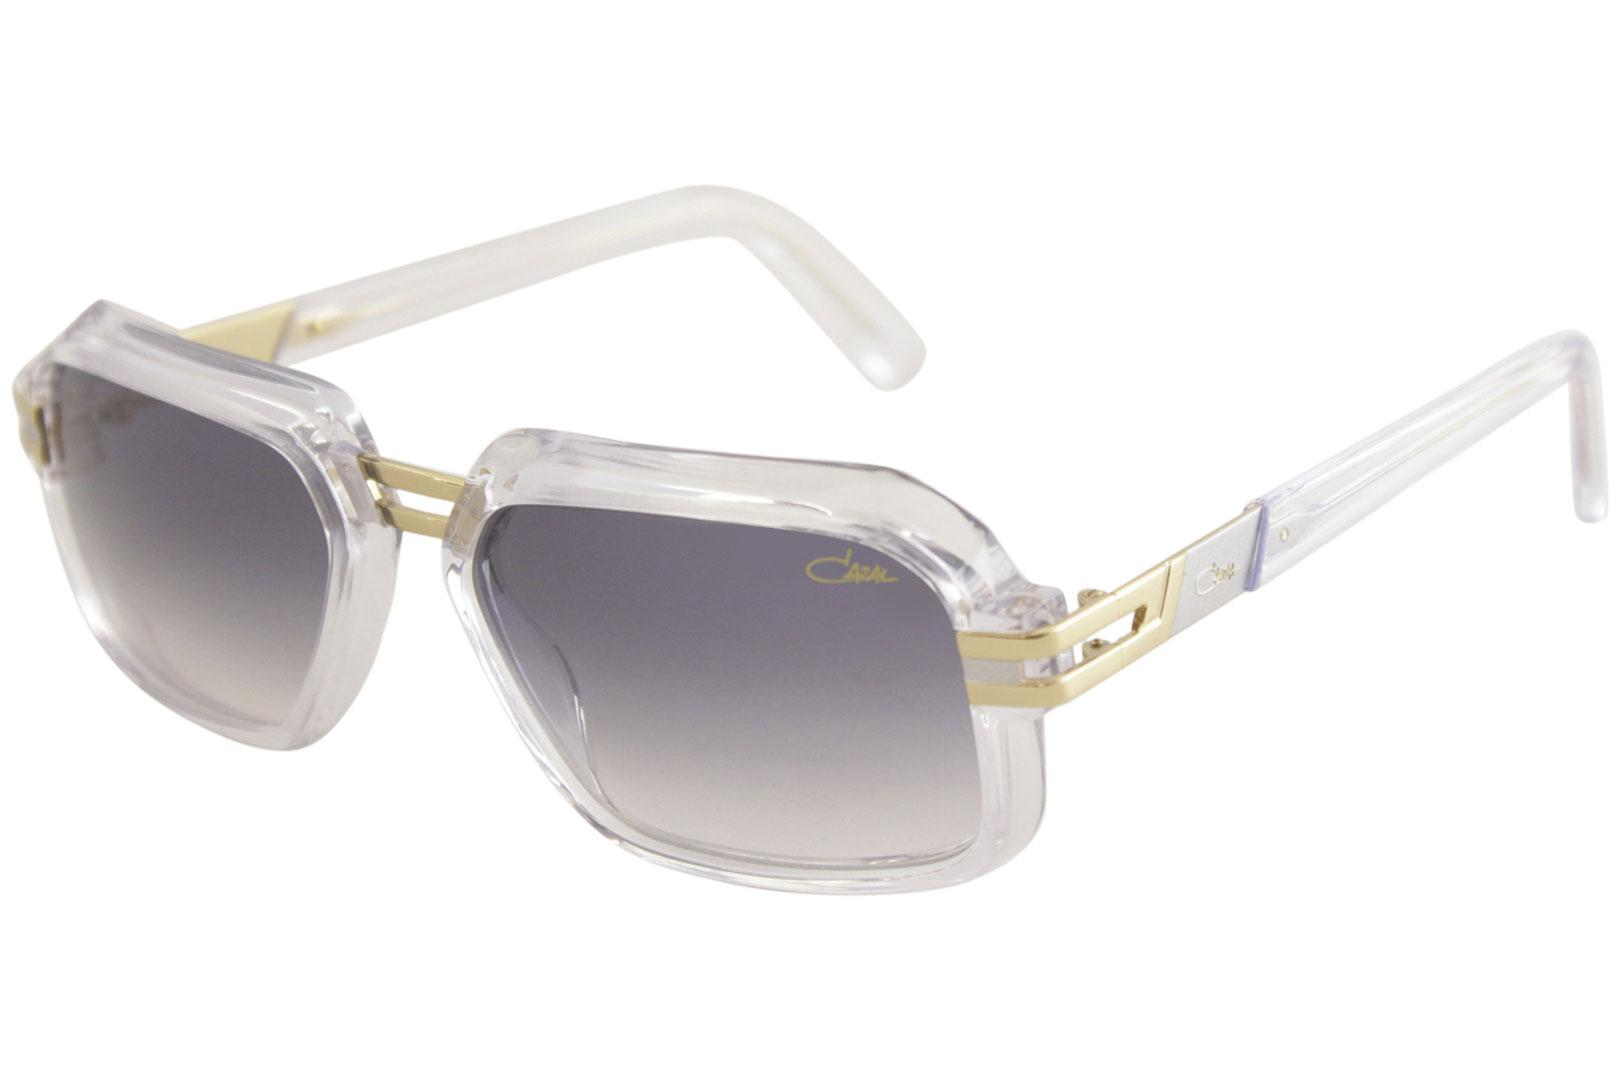 3d65b64c8b Cazal Vintage 6004 3 001 Black Gold Fashion Sunglasses 56mm